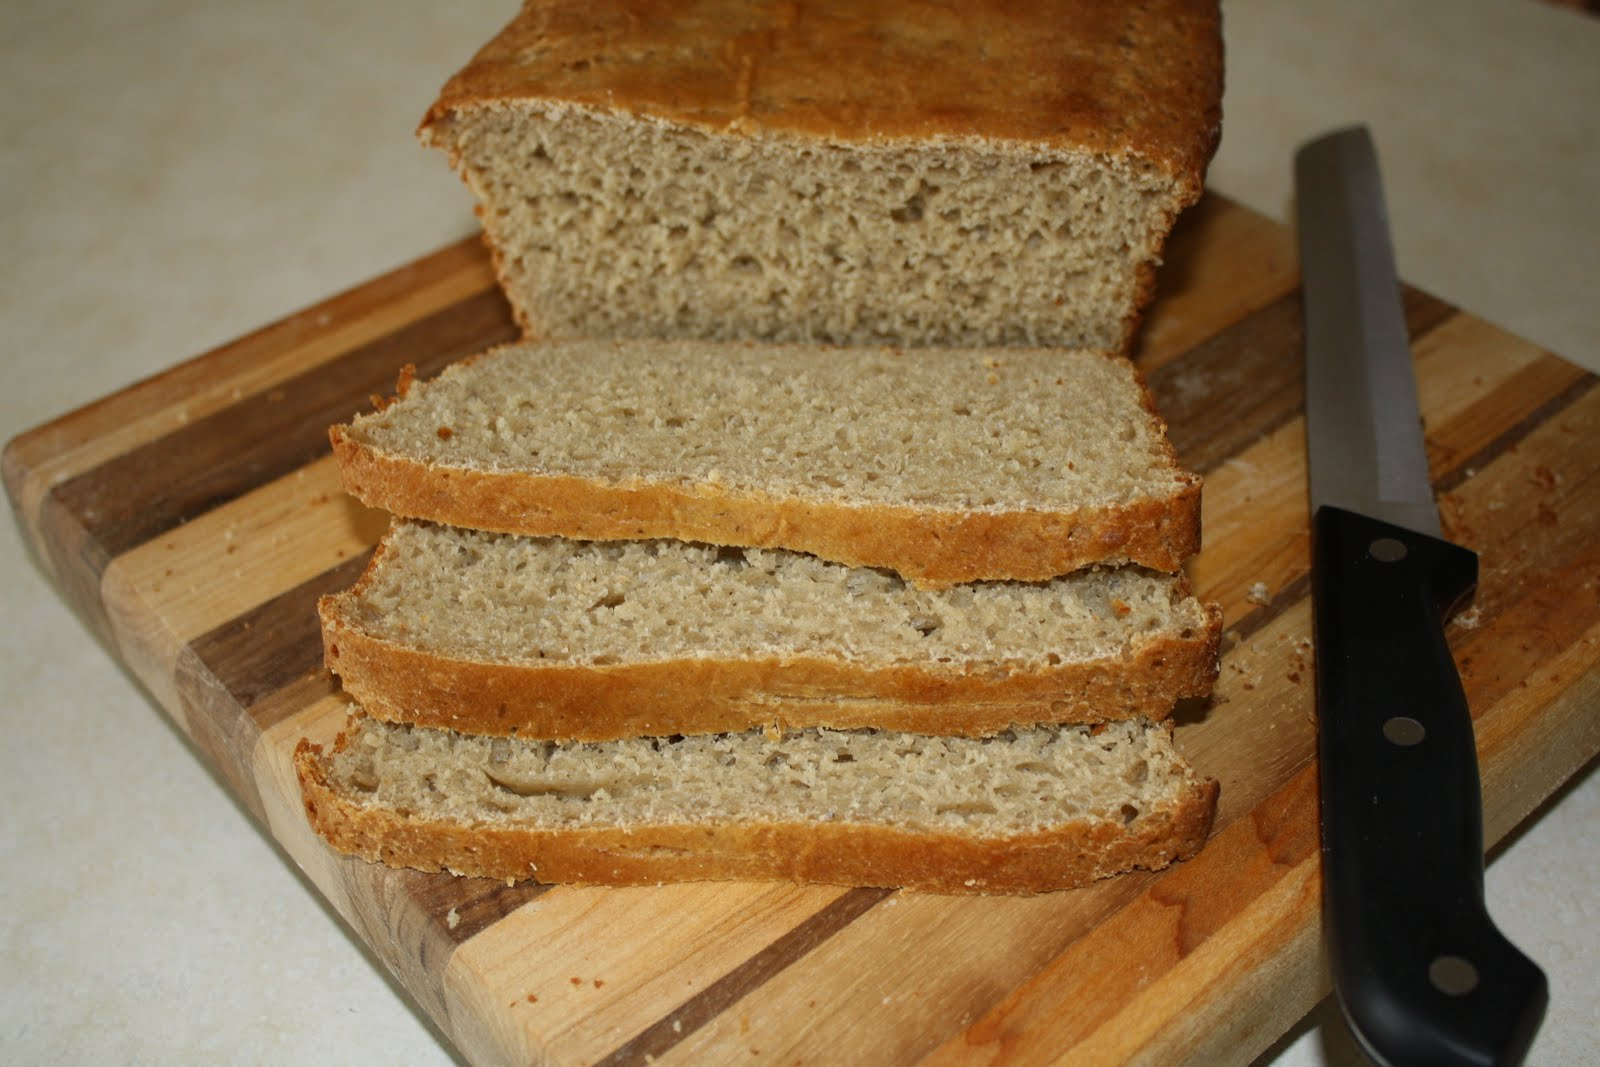 Vollkornbrot (German Whole Grain Seed Bread) - The Daring ...